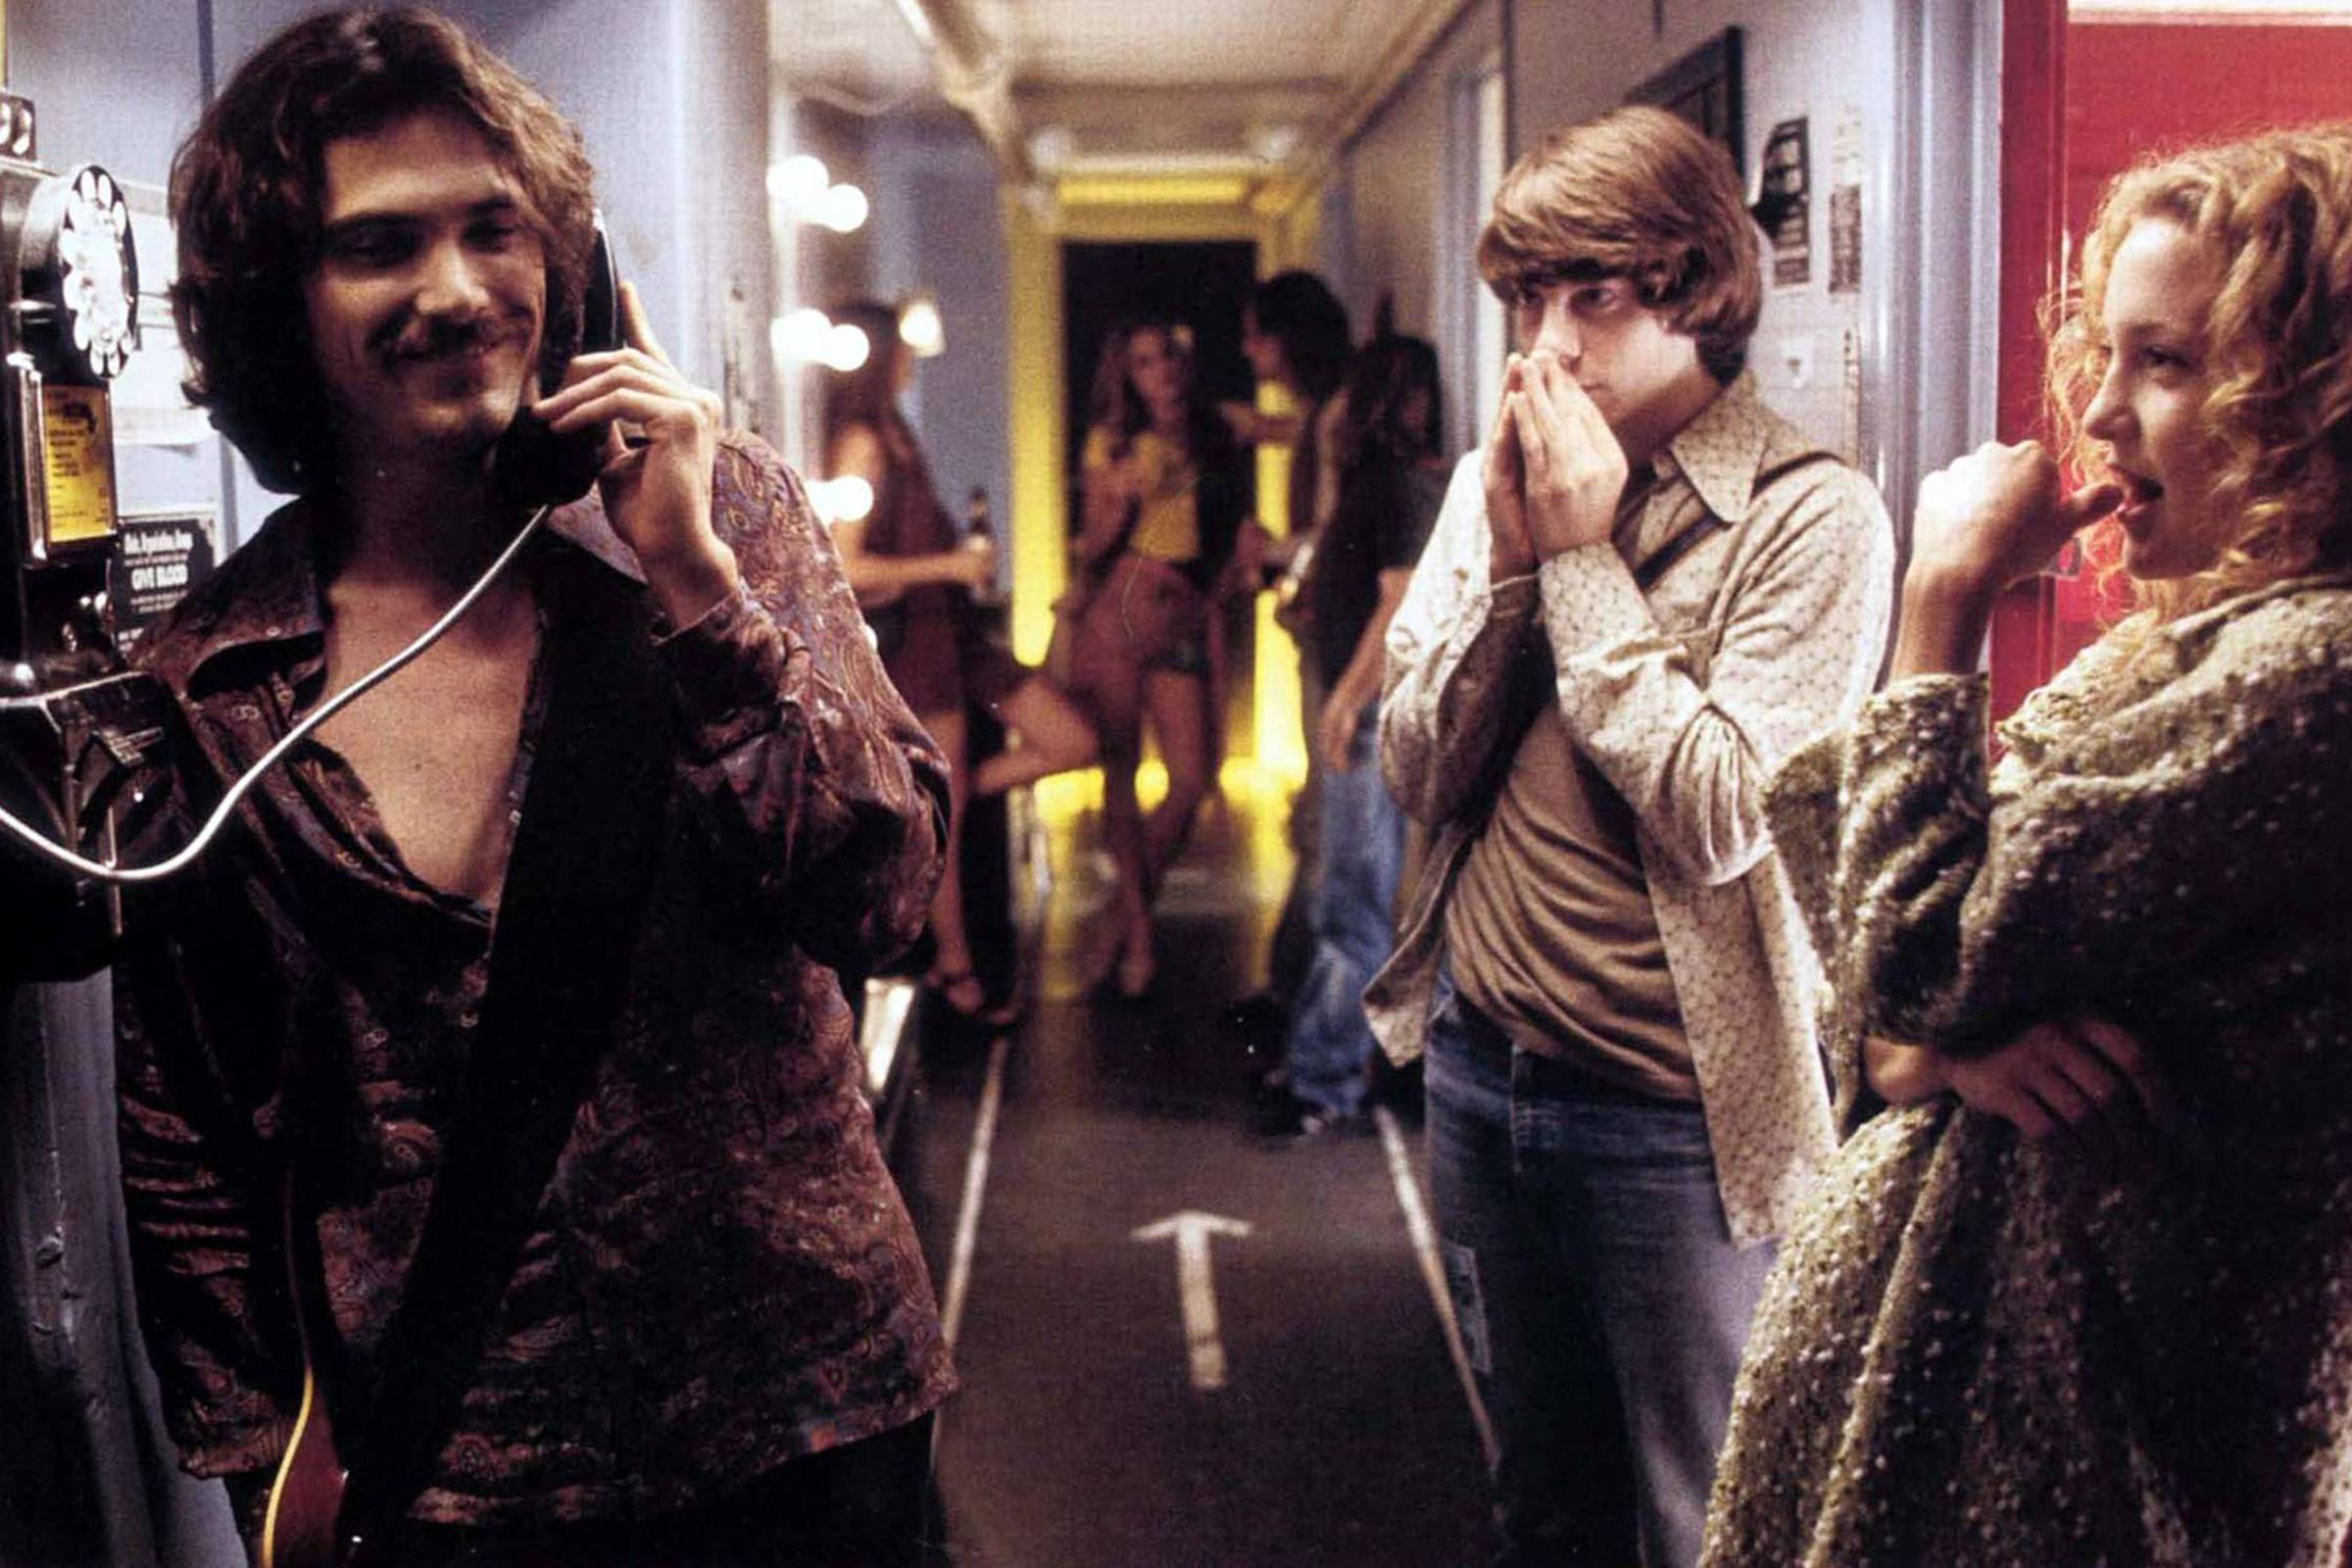 Russell Hammond (Billy Crudup) calls William Miller's (Patrick Fugit) mom